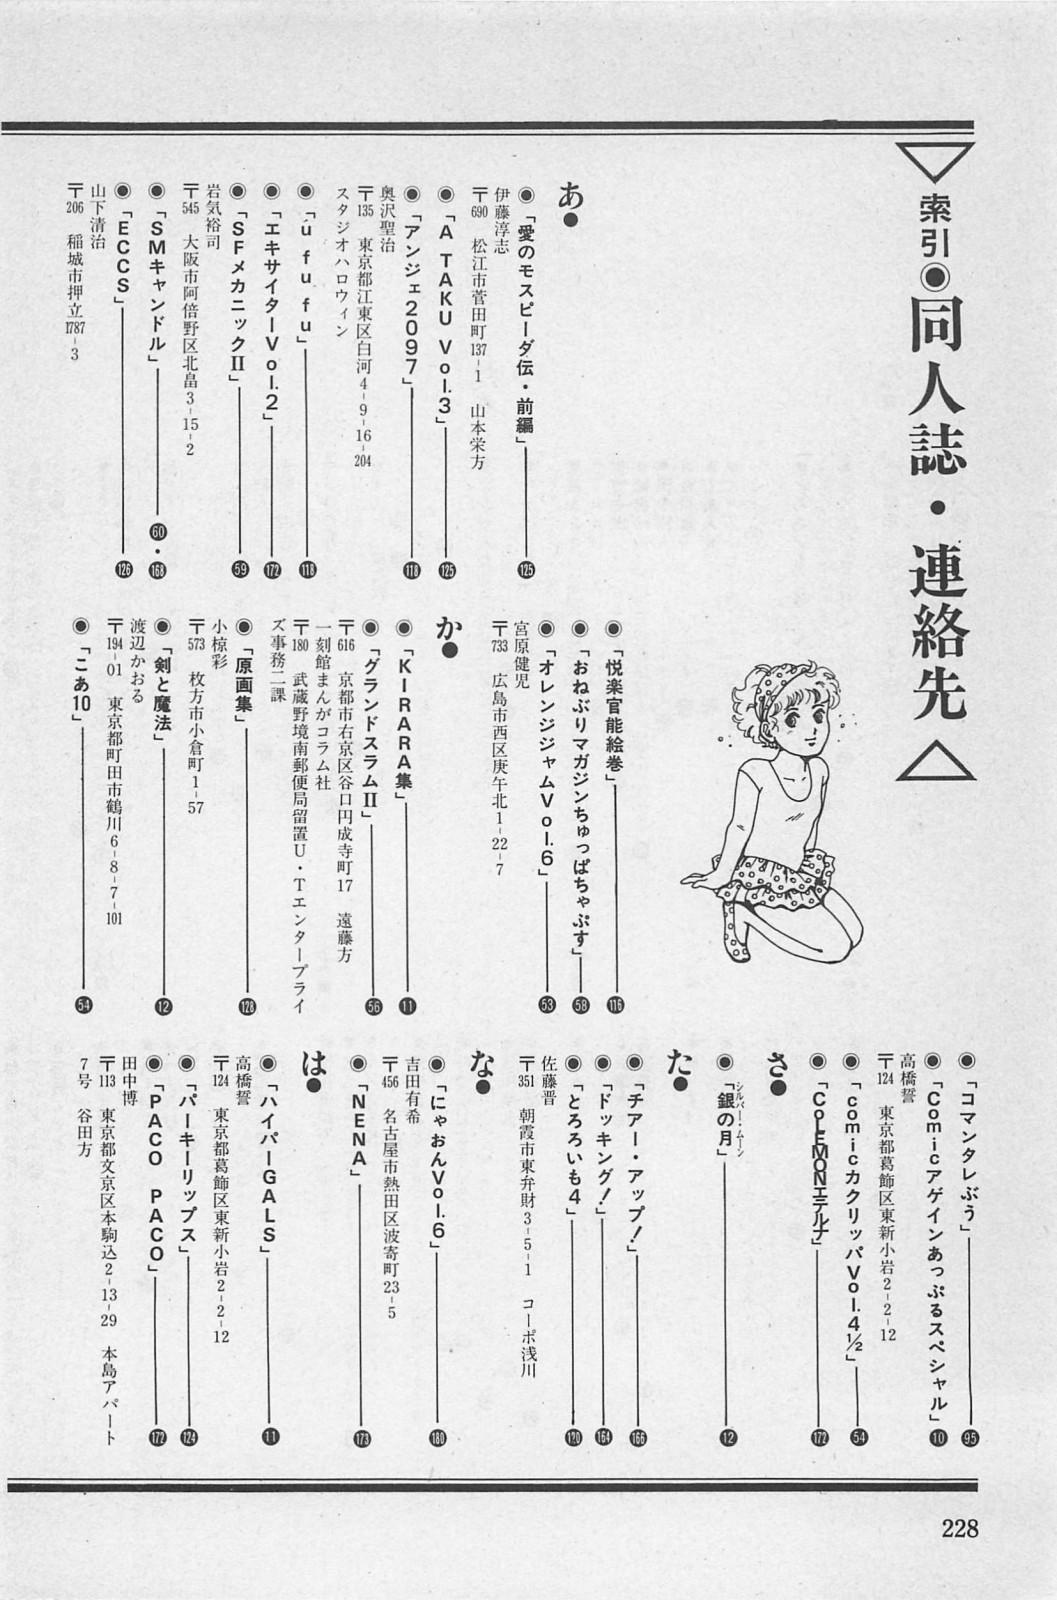 bishoujo syndrome 3 229